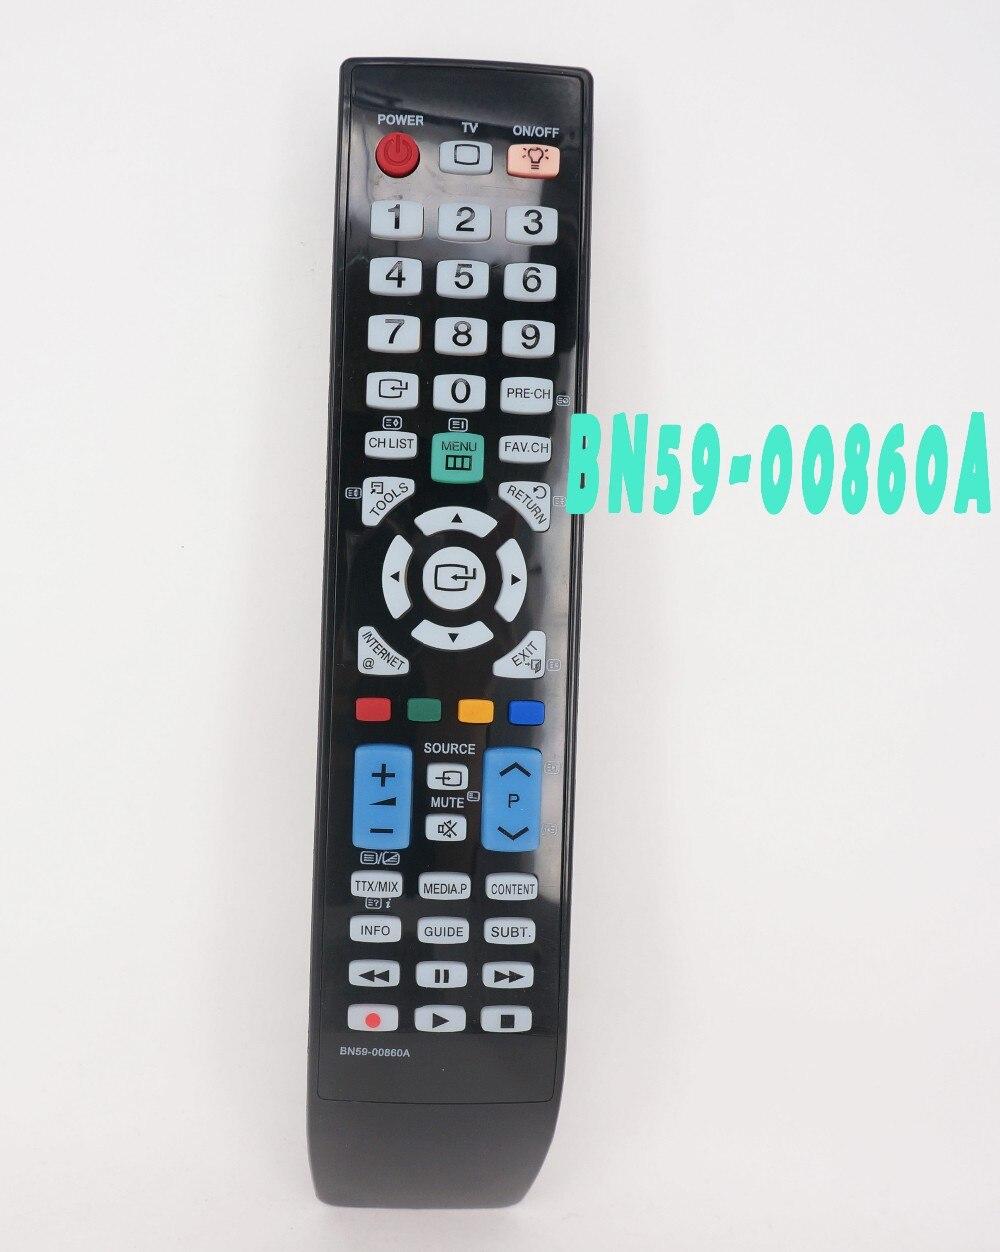 Wholesale Remote Control for Samsung 3D SMART TV Remote BN59-00860A BN59-00937A замена для samsung дистанционного управления bn59 00937a bn59 00937 bn5900937a black